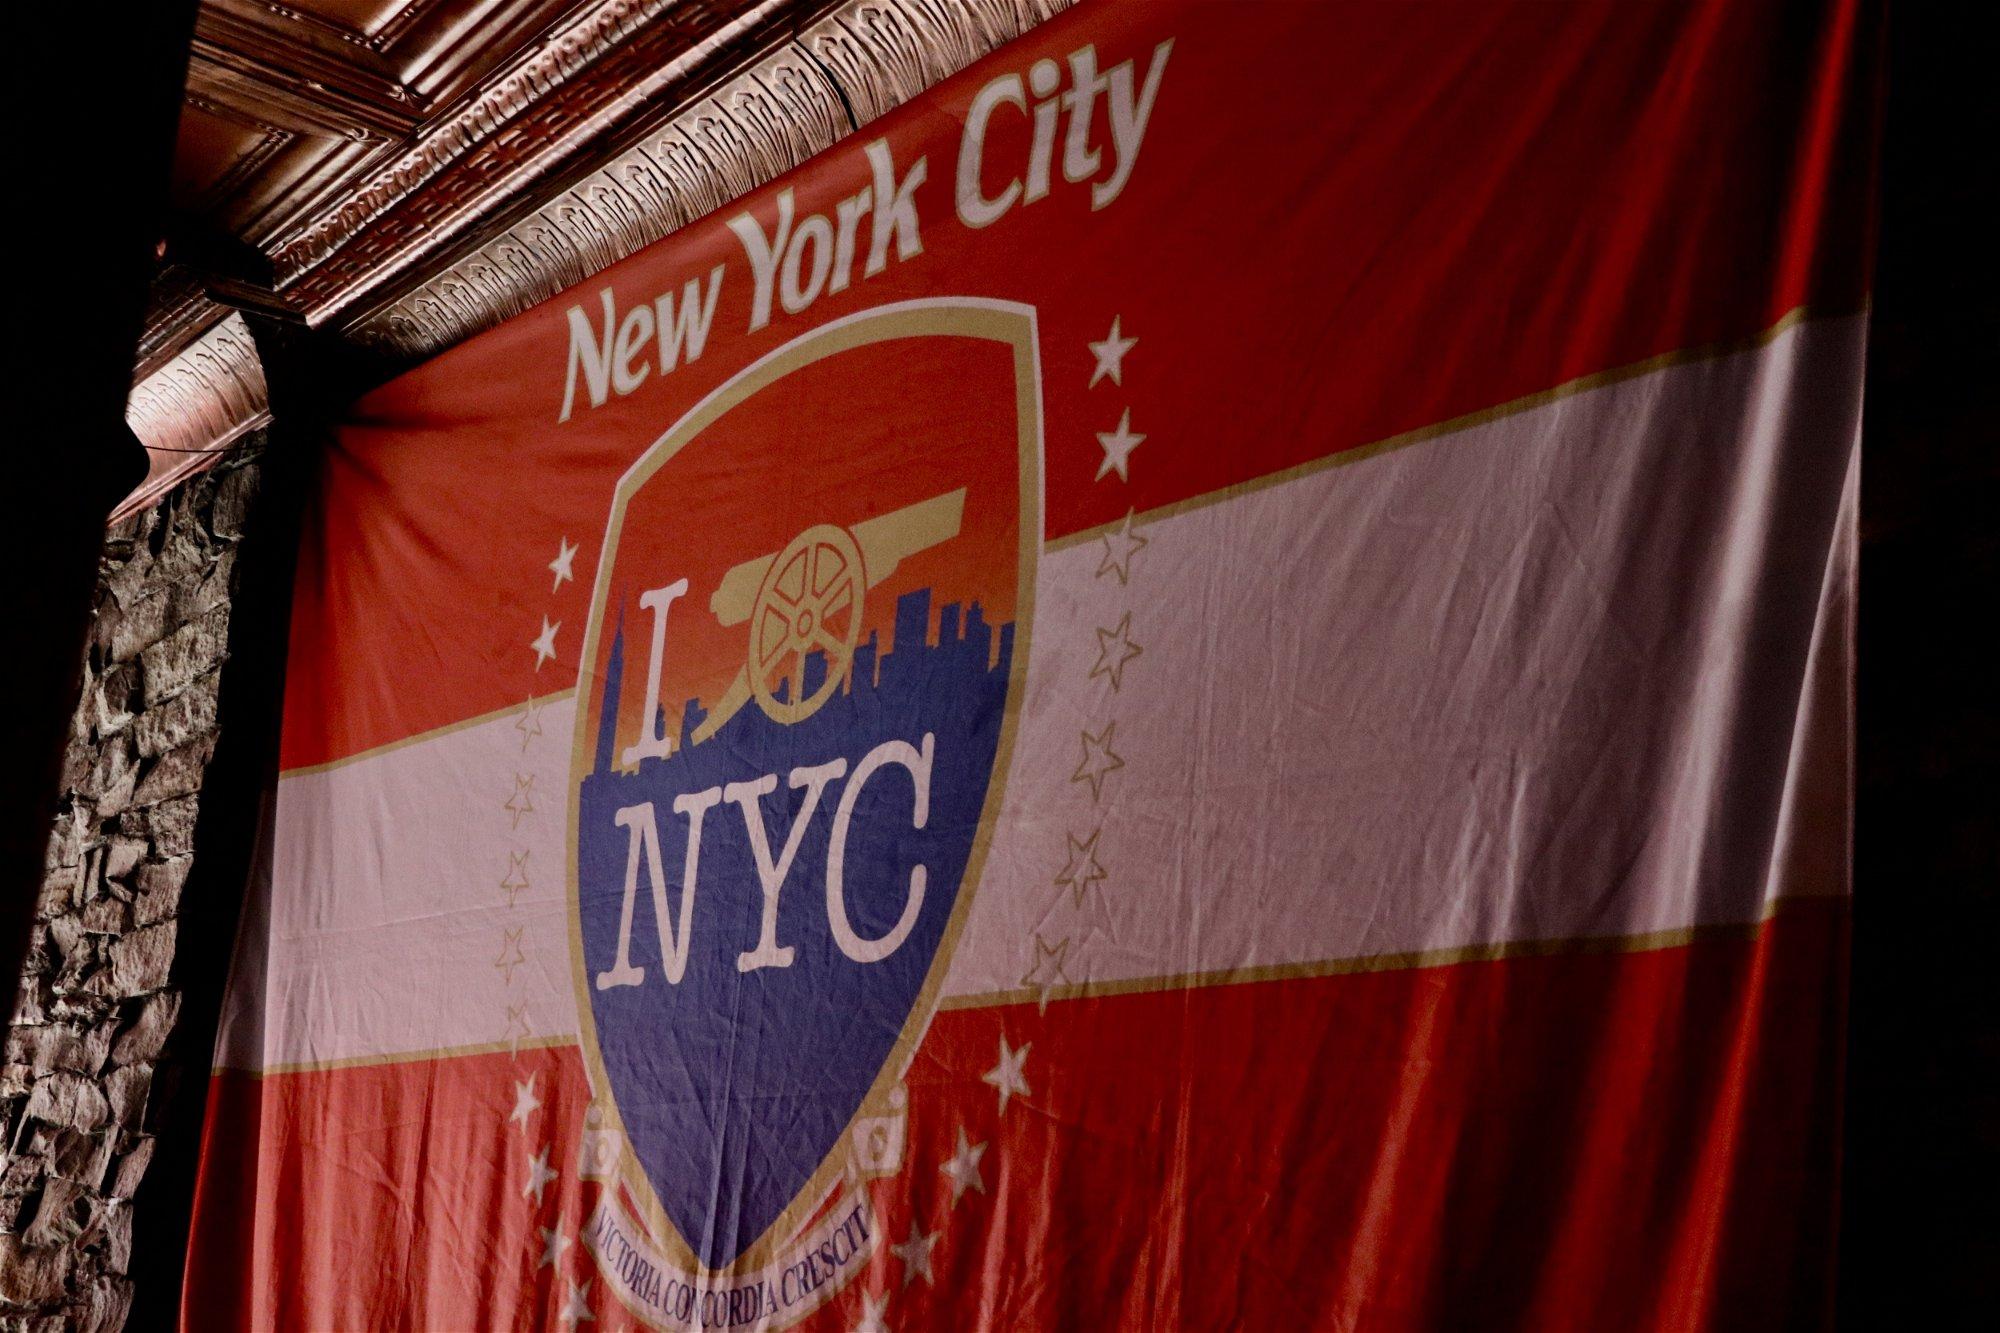 Arsenal NYC flag at The Blind Pig